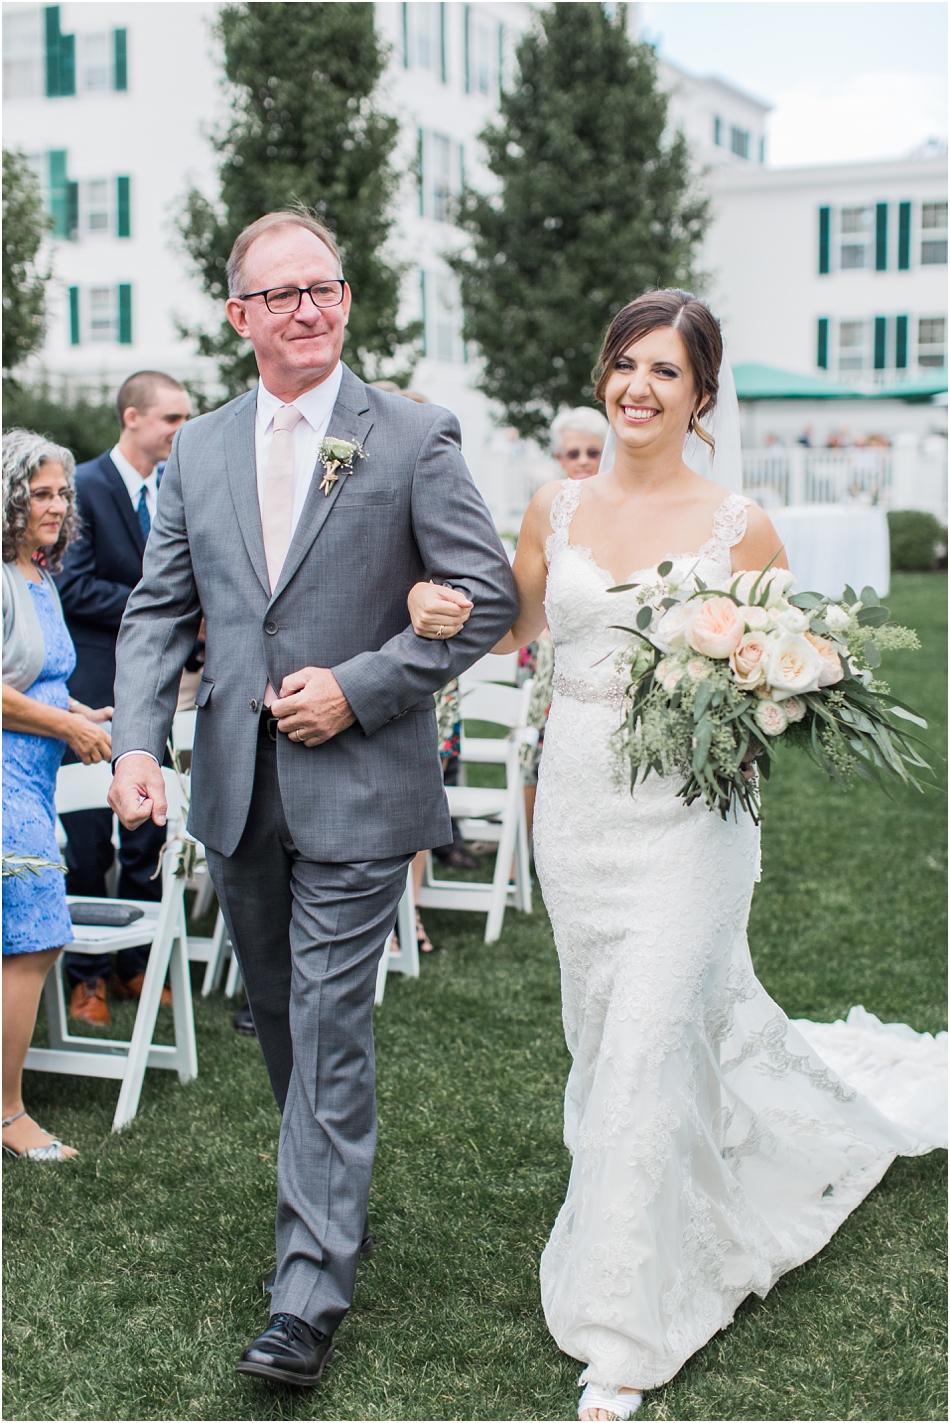 equinox_resort_golf_club_manchester_vermont_jennifer_matt_cape_cod_boston_new_england_wedding_photographer_Meredith_Jane_Photography_photo_2371.jpg